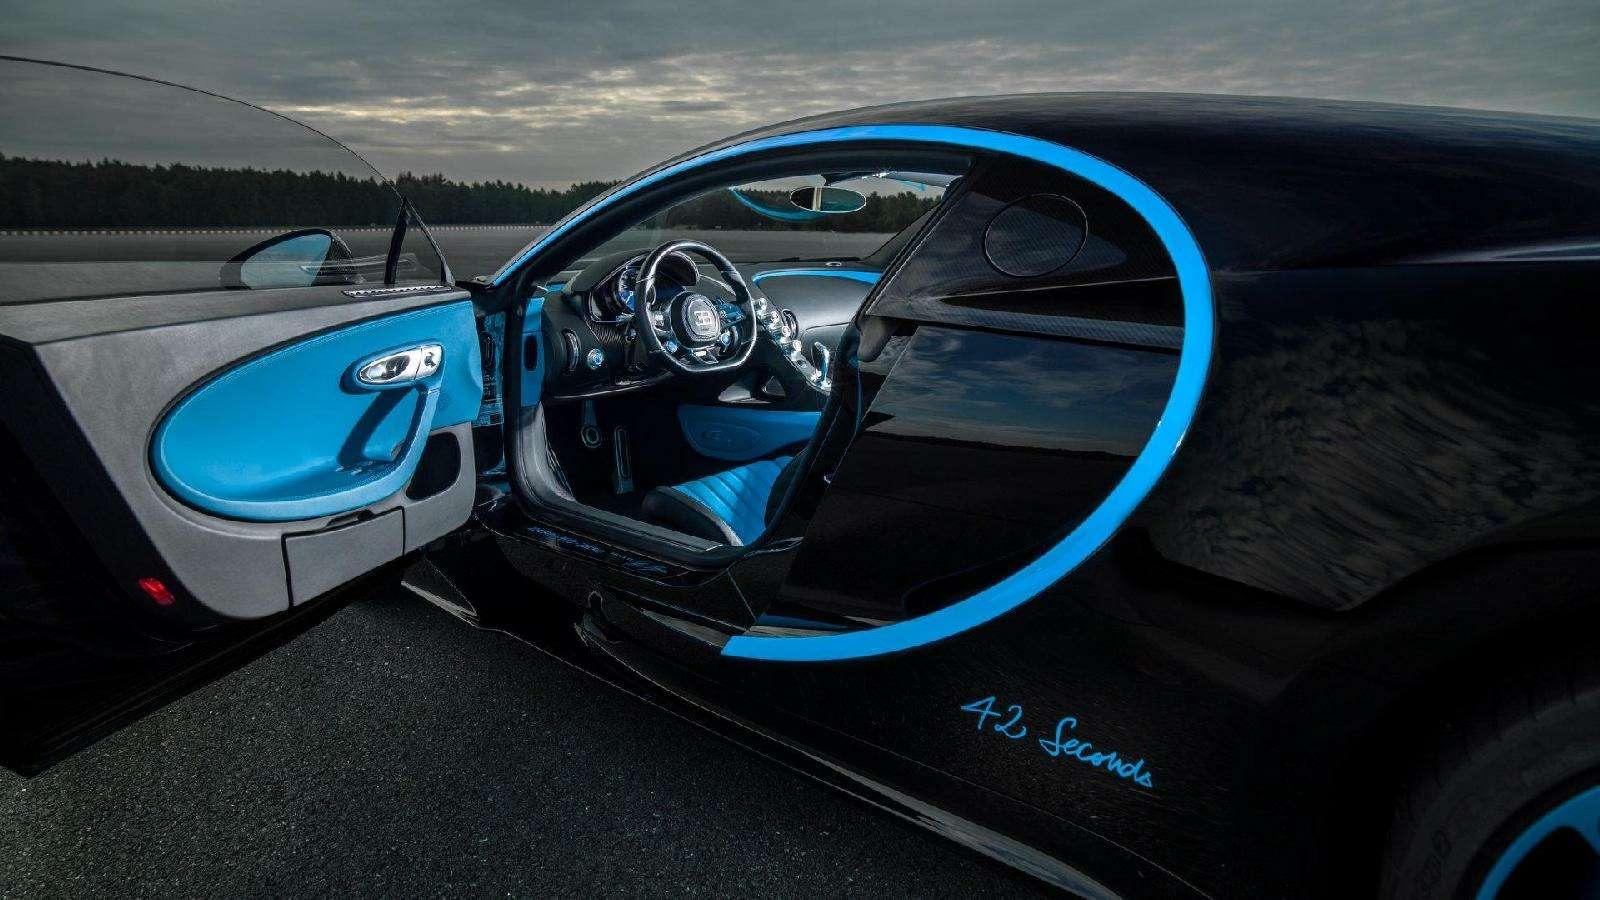 0-400-0 км/ч— видео рекордного заезда Bugatti Chiron— фото 794901